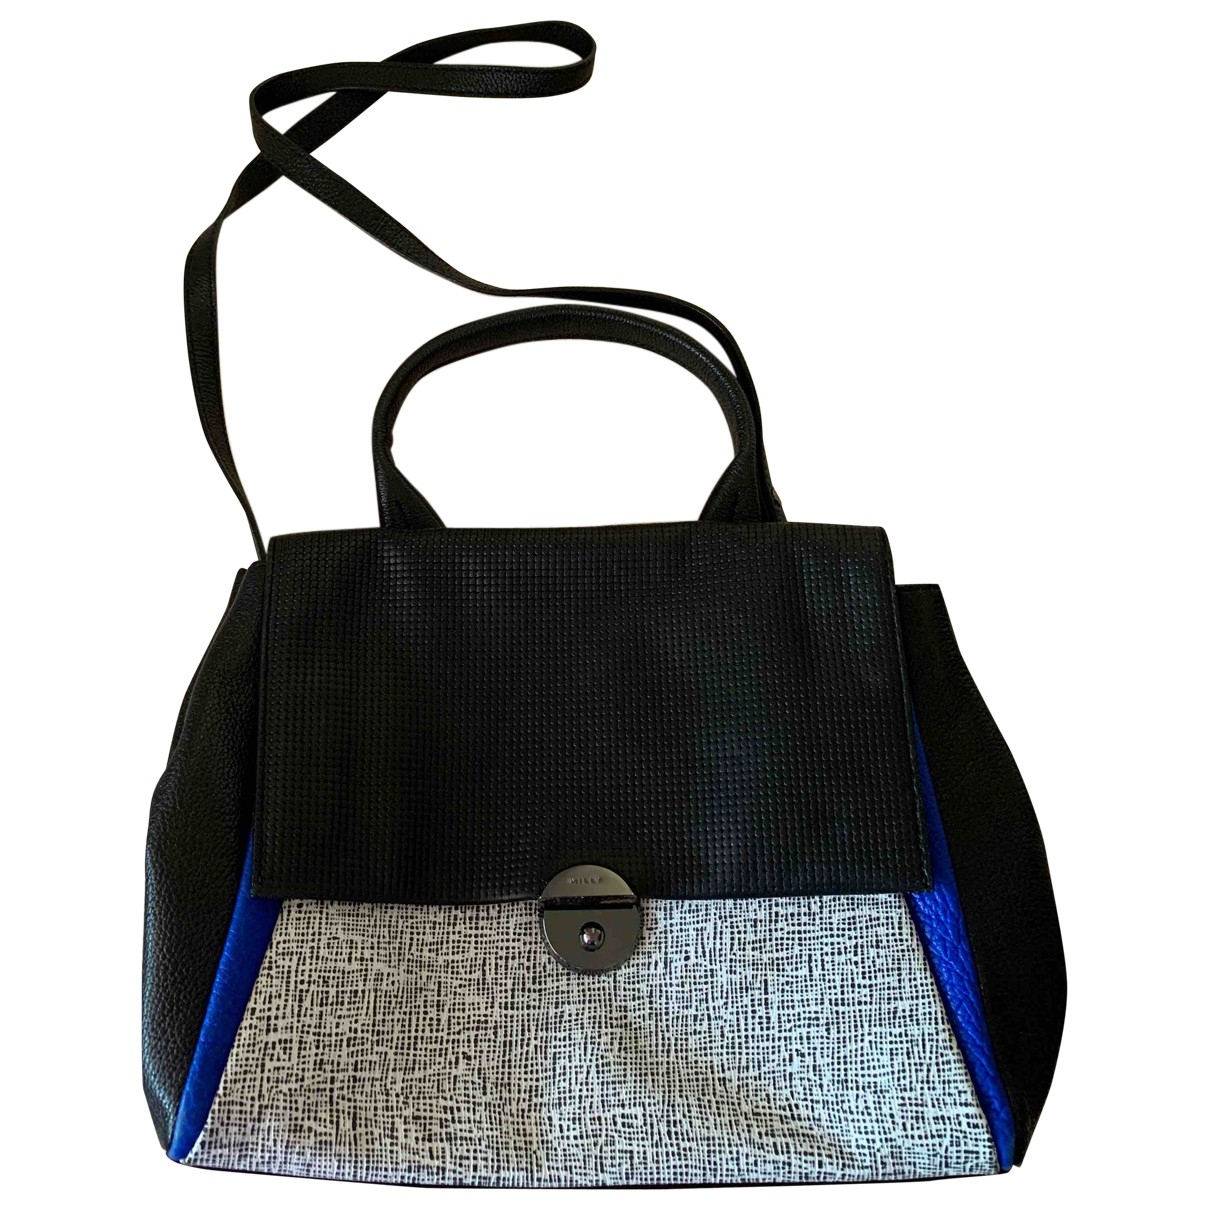 Milly \N Multicolour Leather handbag for Women \N